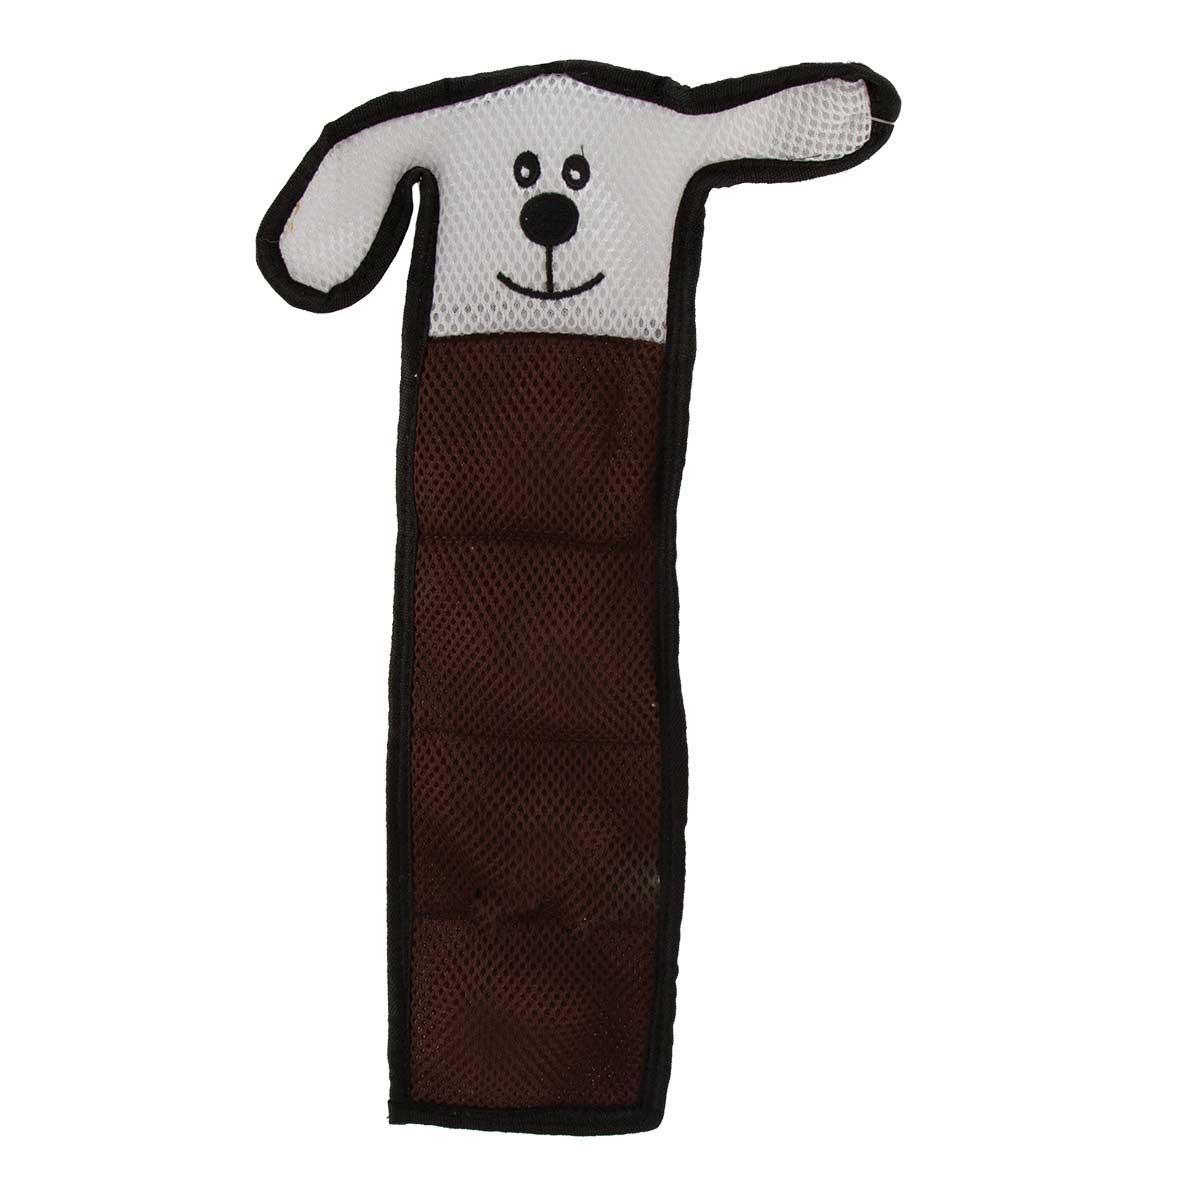 15 inch Dawgeee Toy Brown Crinkle Skin Animal Dog Toys